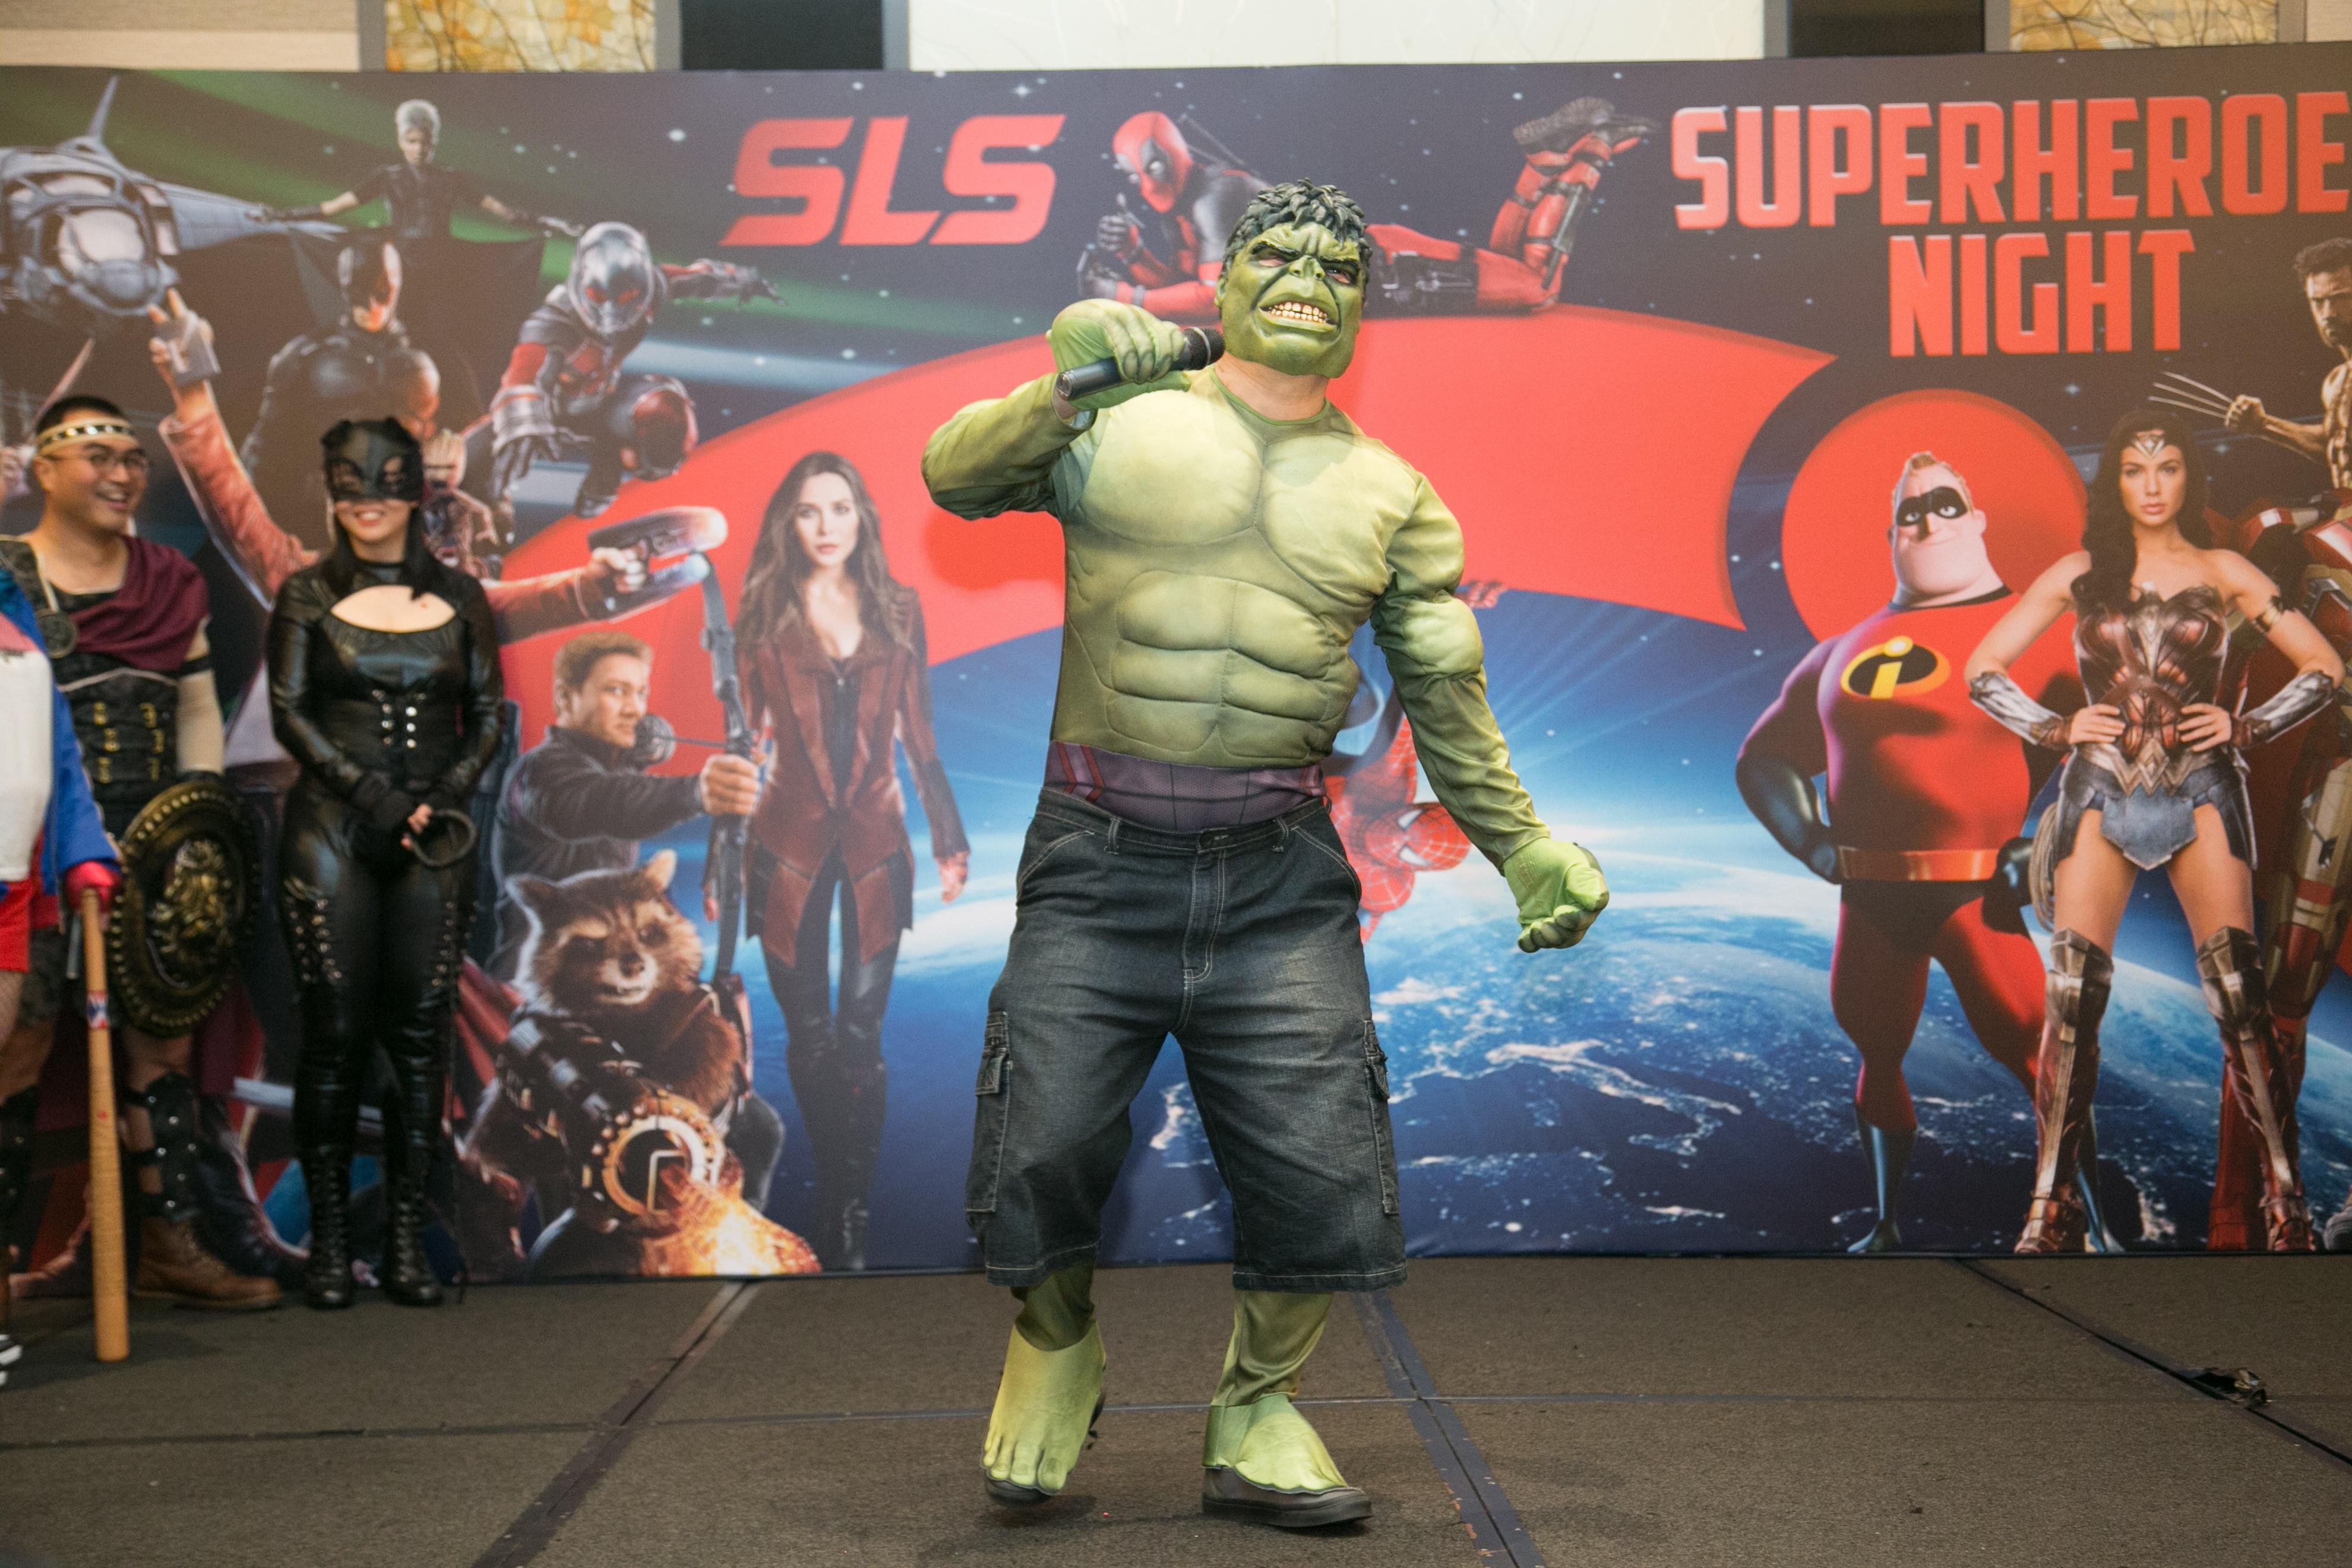 SLS Super Heroes Night 2018